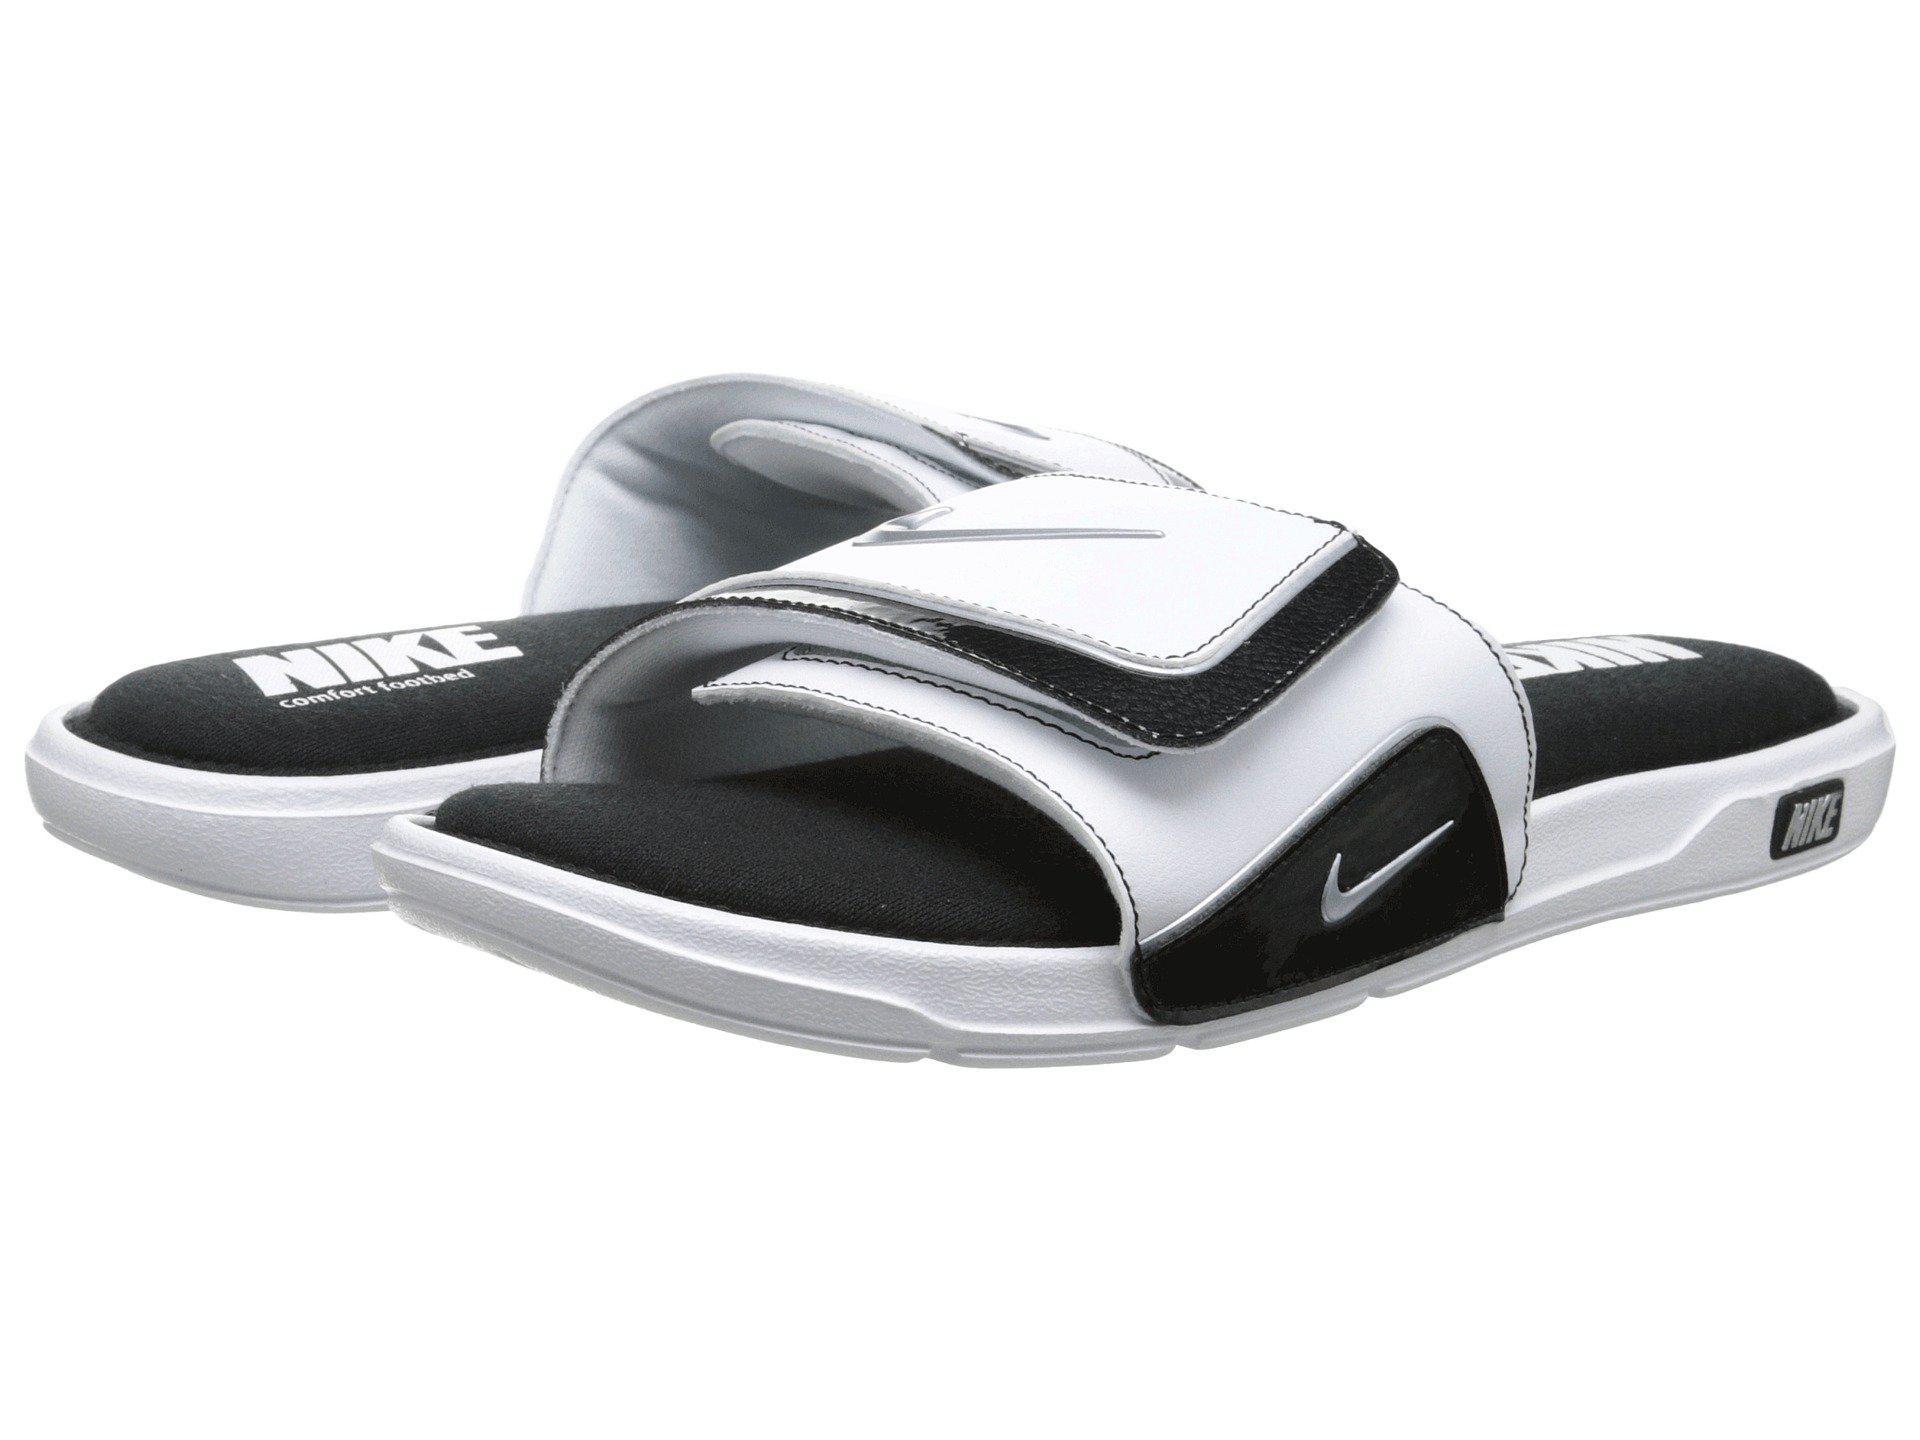 c4c0cb3fb217f3 Lyst - Nike Comfort Slide 2 (black metallic Silver white) Men s ...